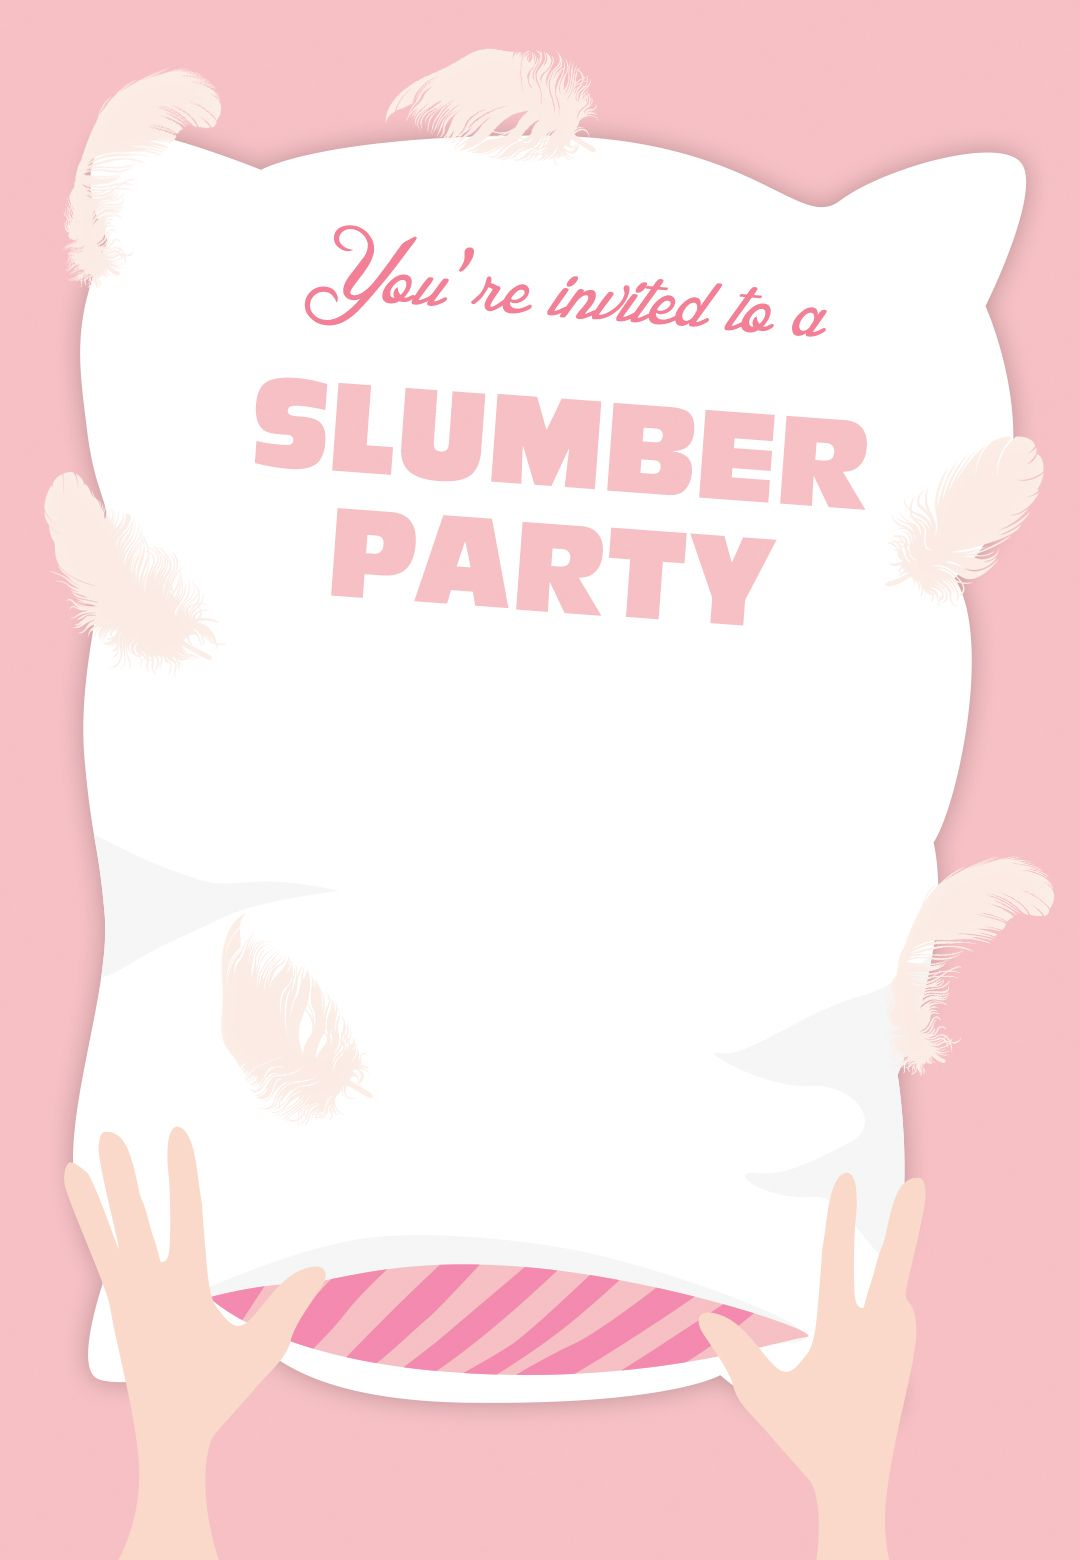 Free Printable Birthday Invitations For Kids freeprintables – Pajama Party Invitations Free